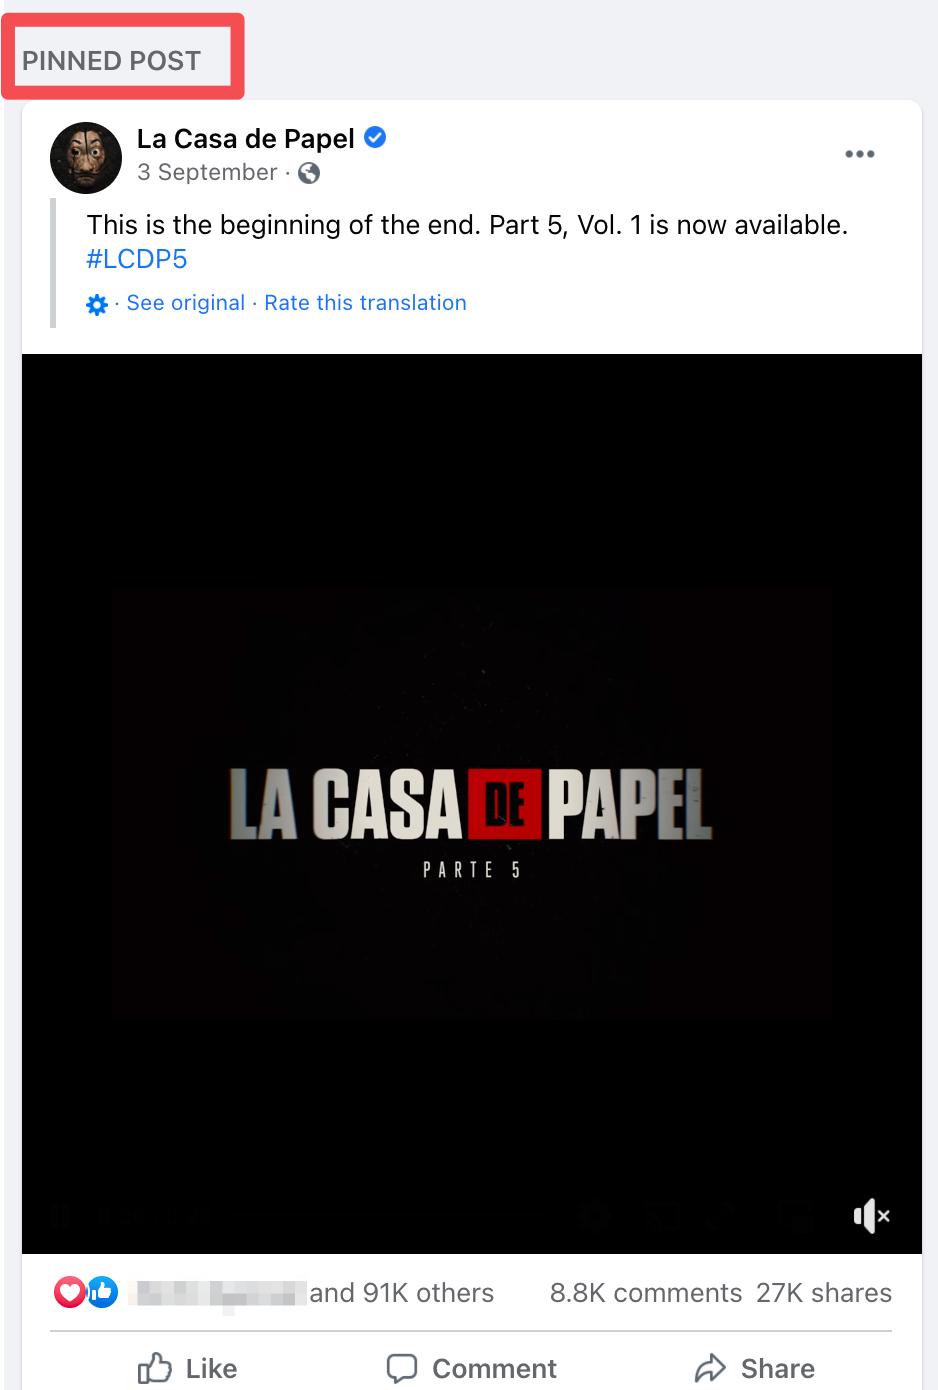 facebook marketing la casa de papel pinned post